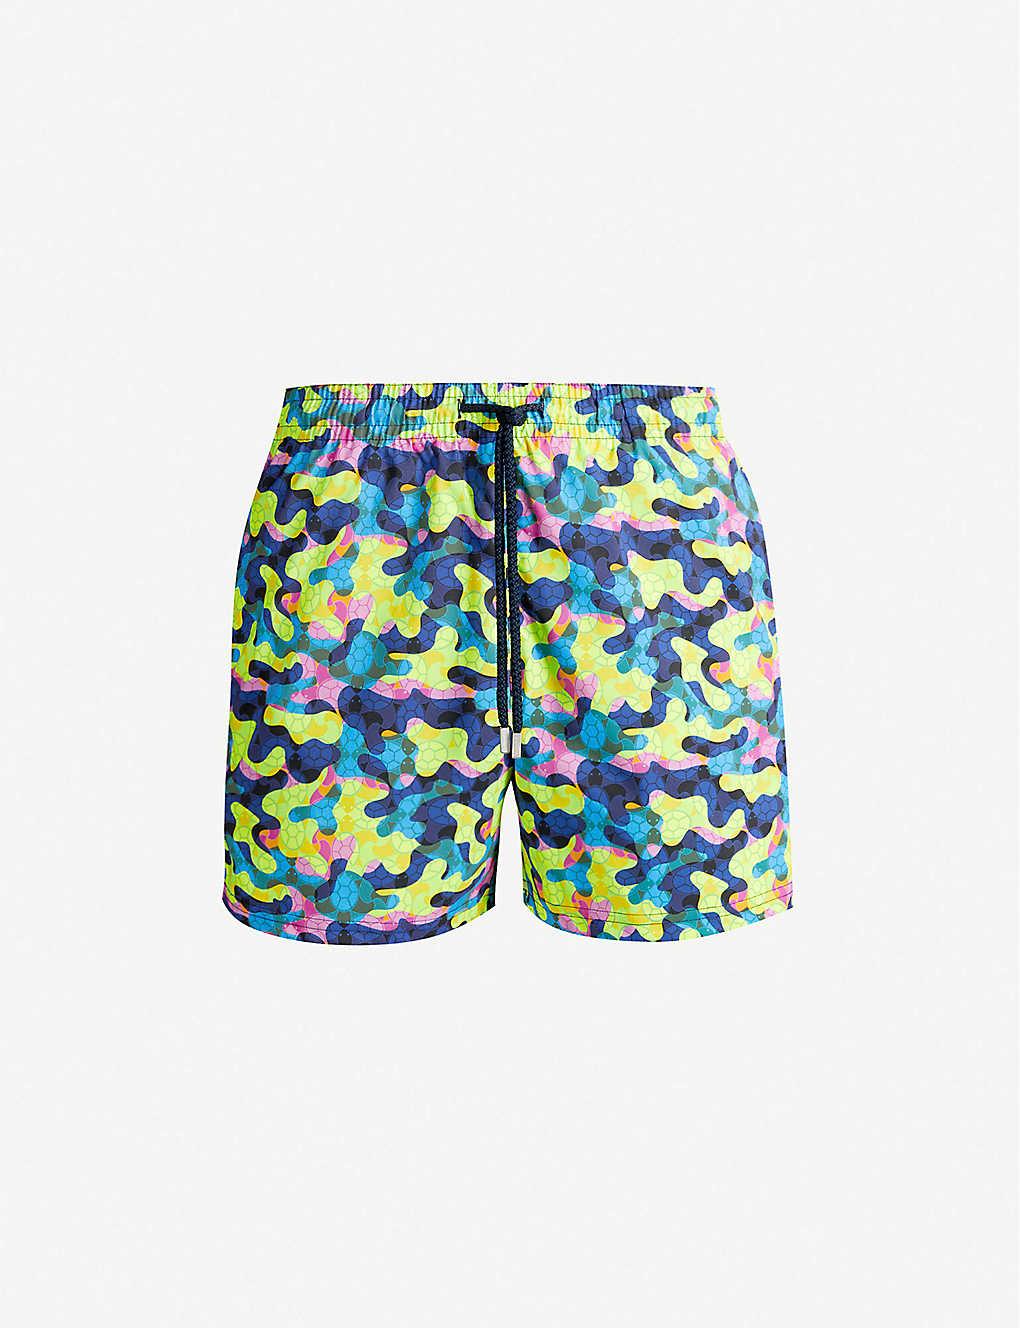 95642cf29b ... Moorise camouflage turtle-print swim shorts - Neon yellow ...